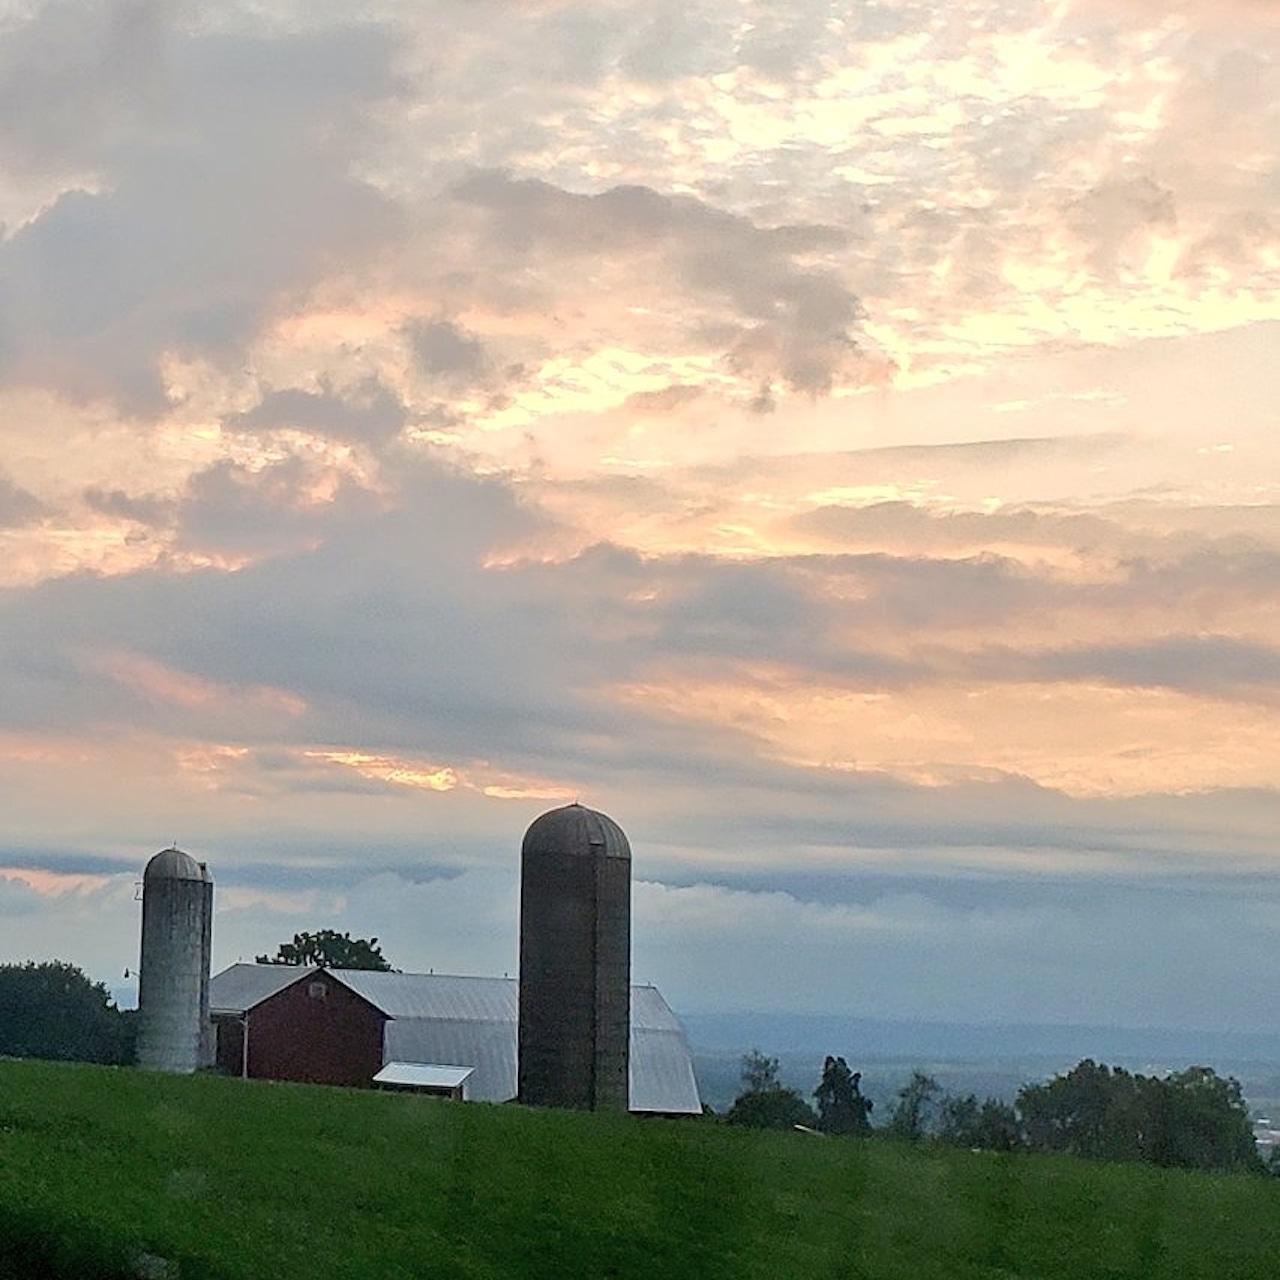 Over the farm (photo)